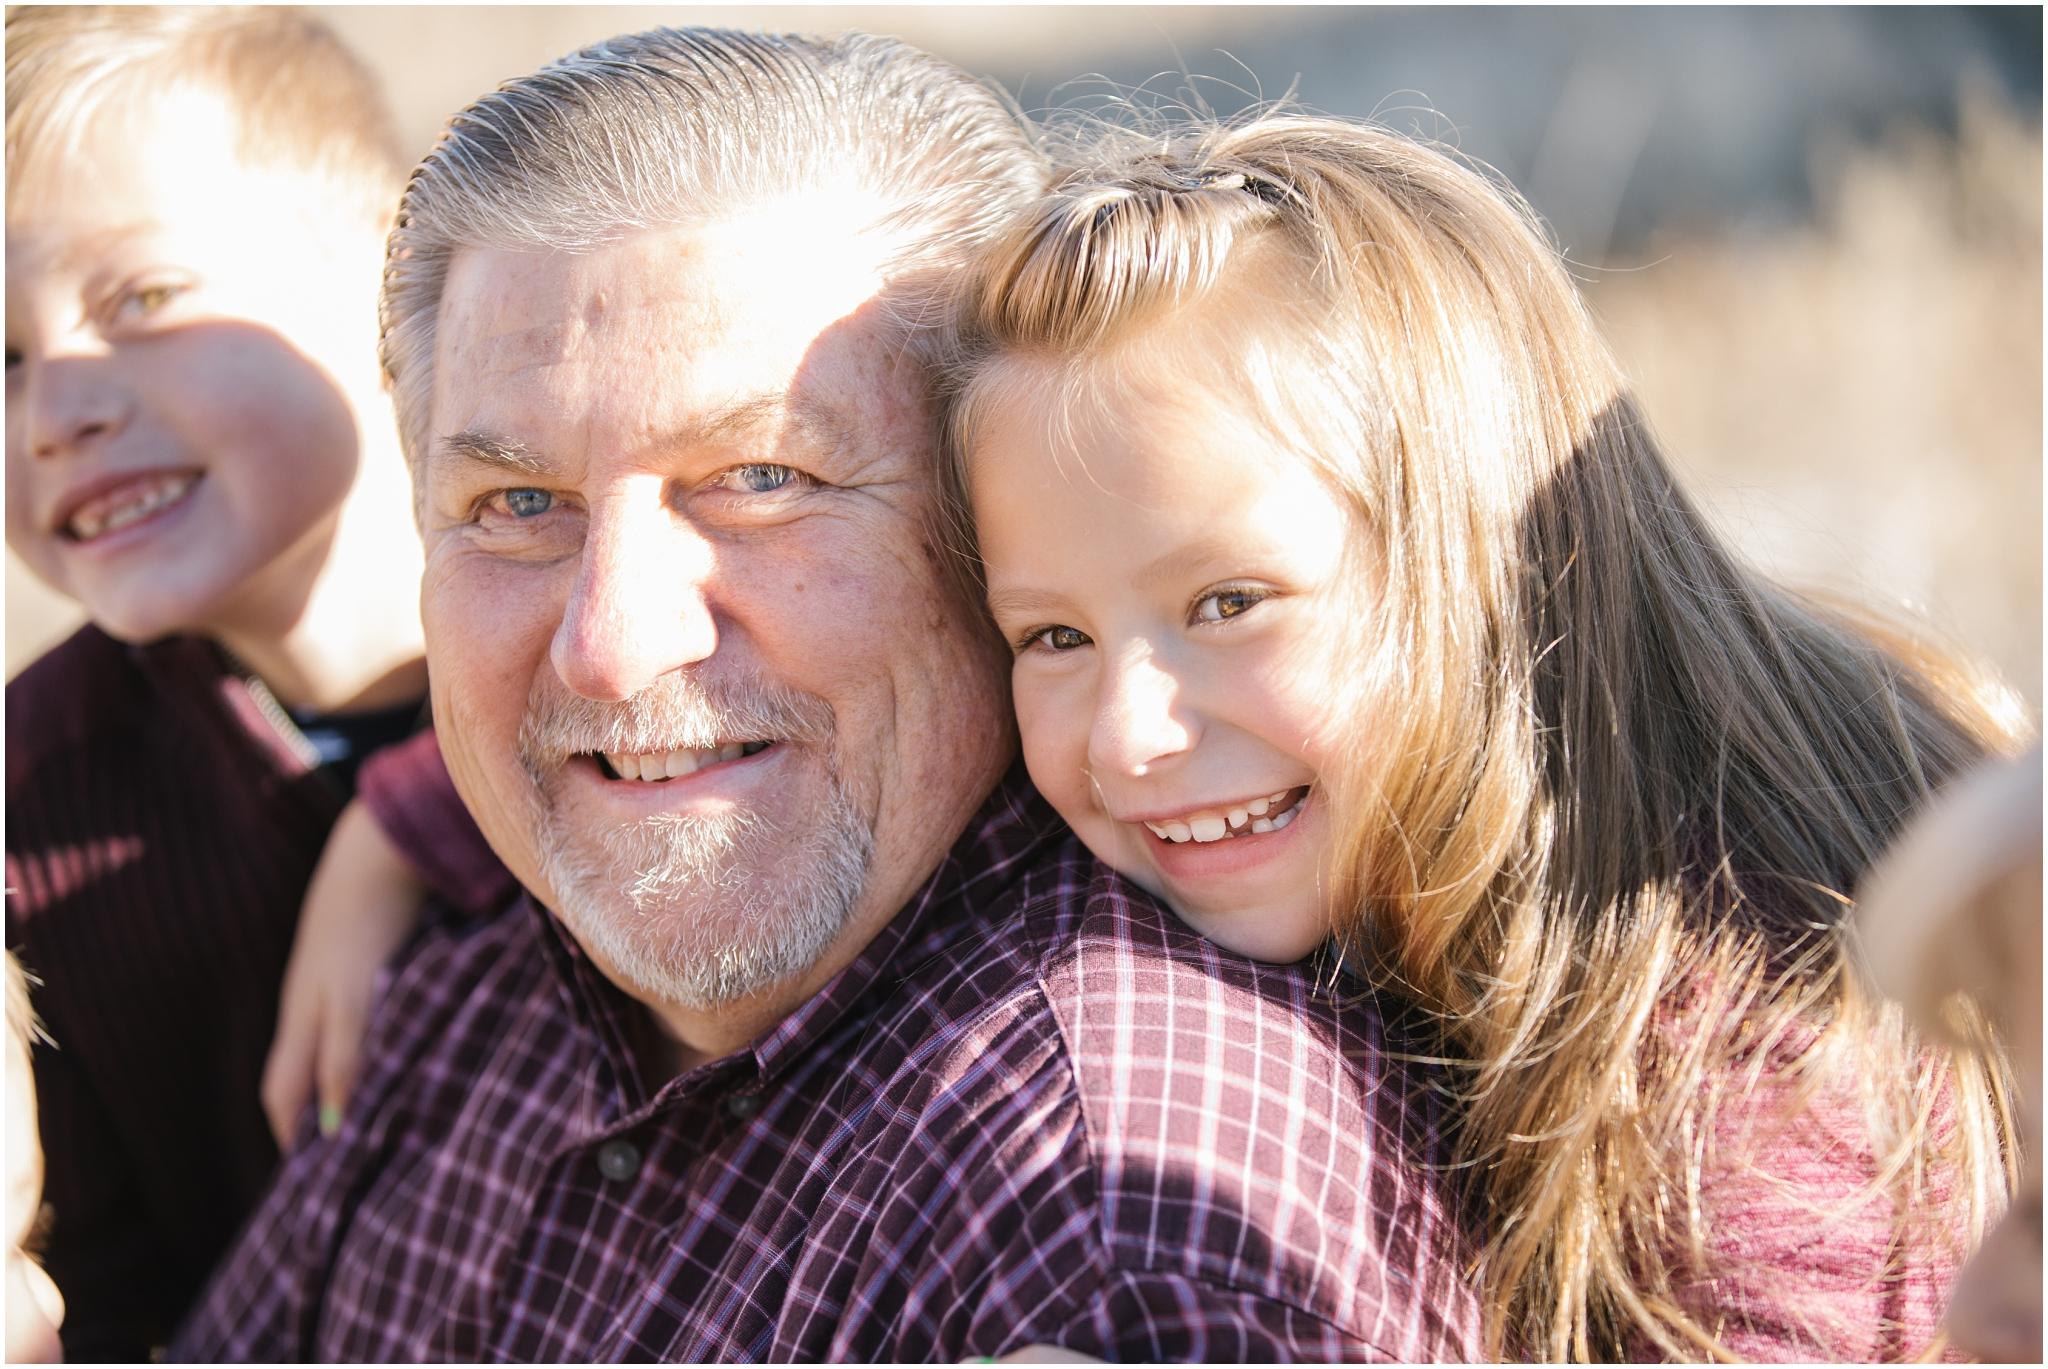 Laws-32_Lizzie-B-Imagery-Utah-Family-Photographer-Salt-Lake-City-Park-City-Davis-County-Clearfield.jpg